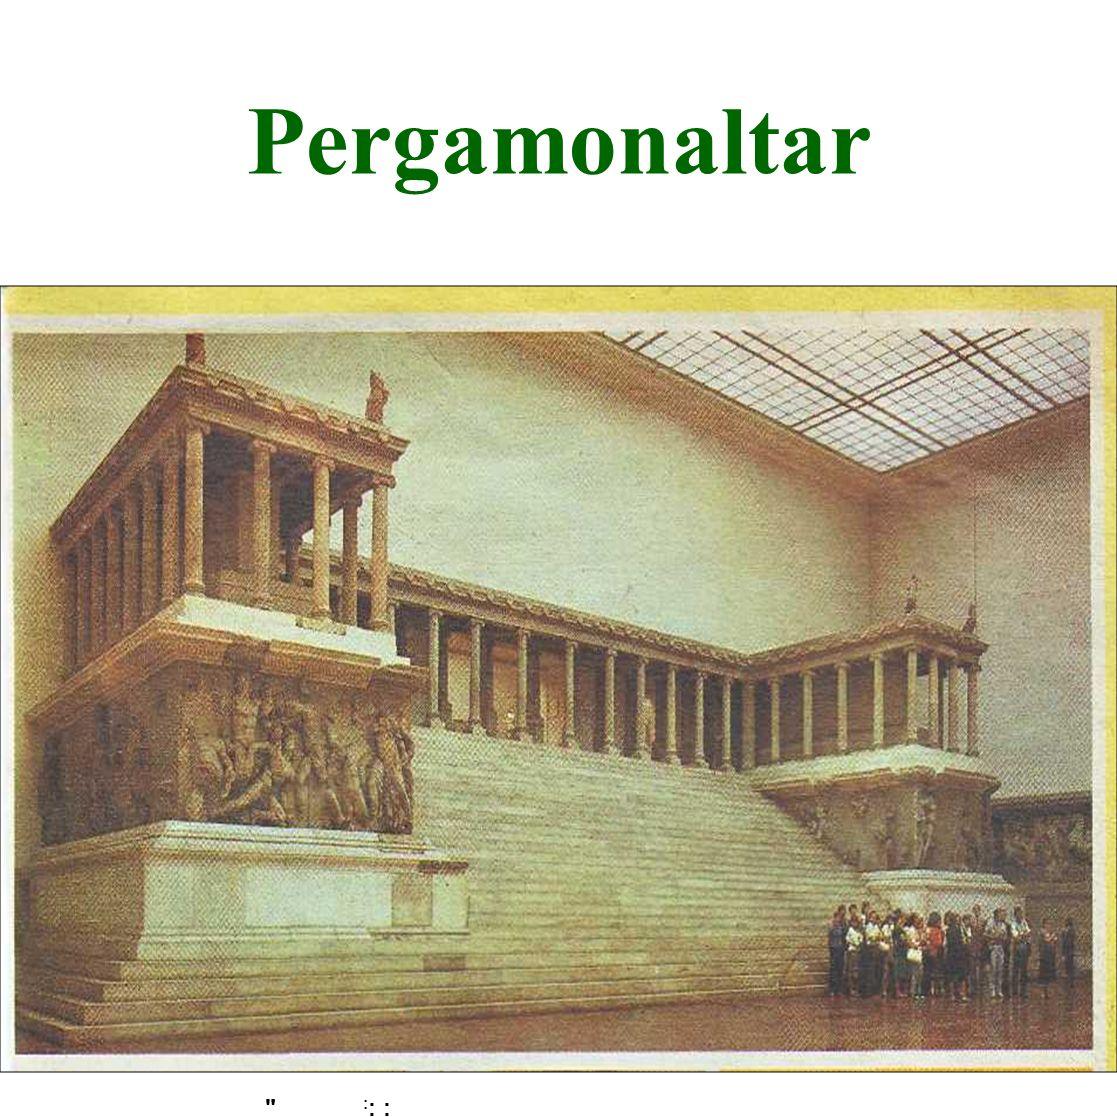 : : : Pergamonaltar